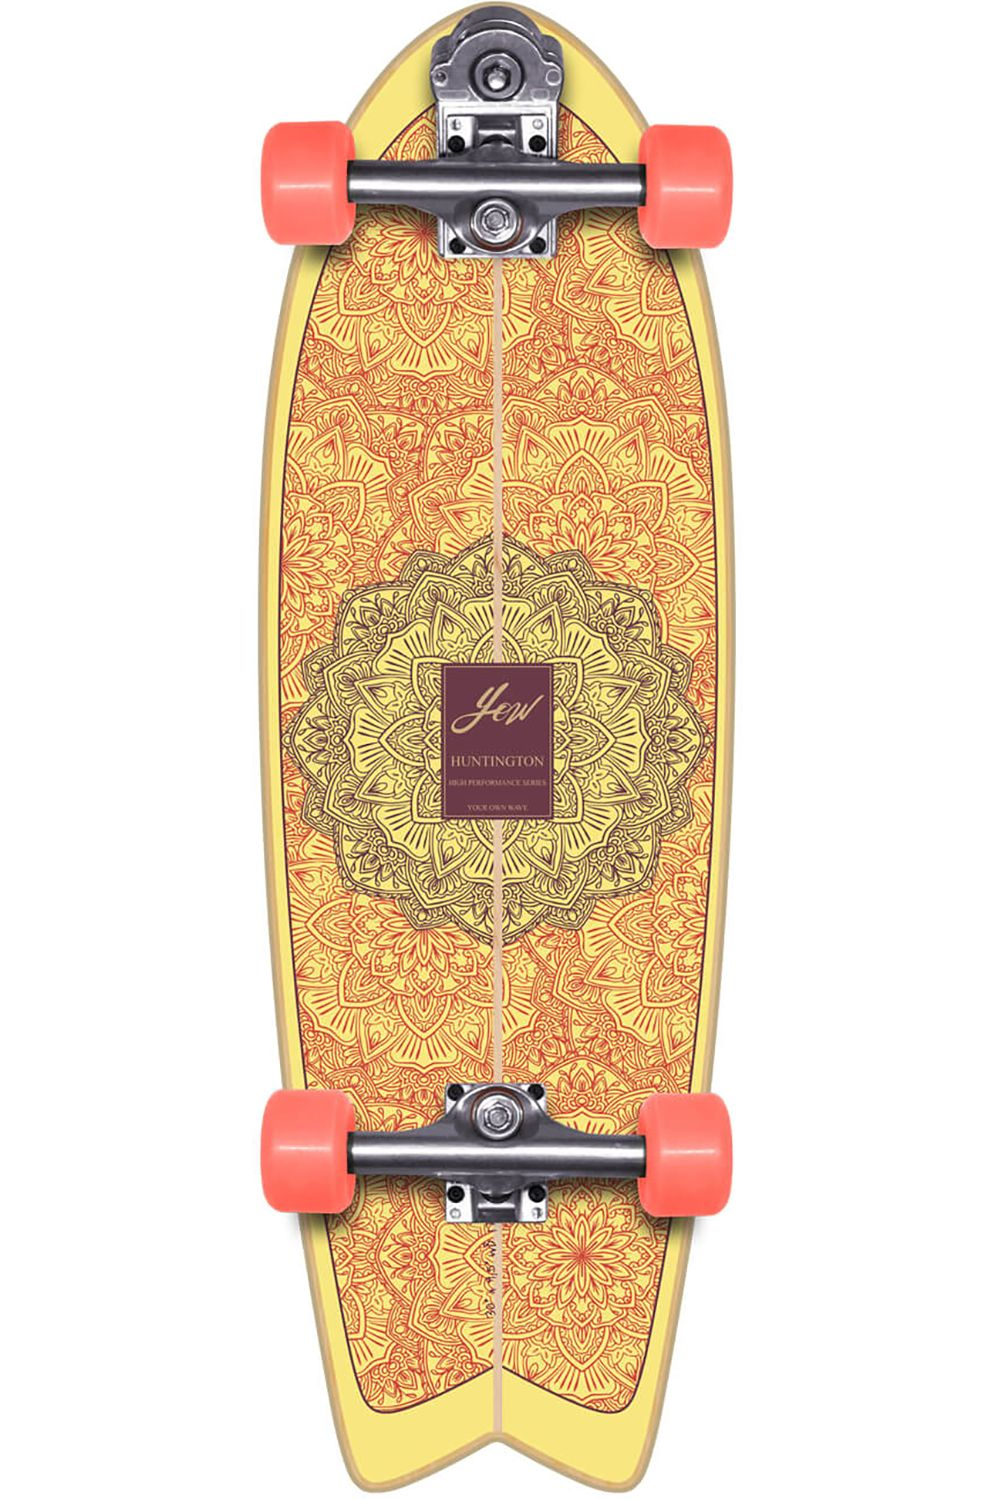 "Yow Surf Skate 30"" HUNTINGTON BEACH HIGH PERFORMANCE SERIES Orange"